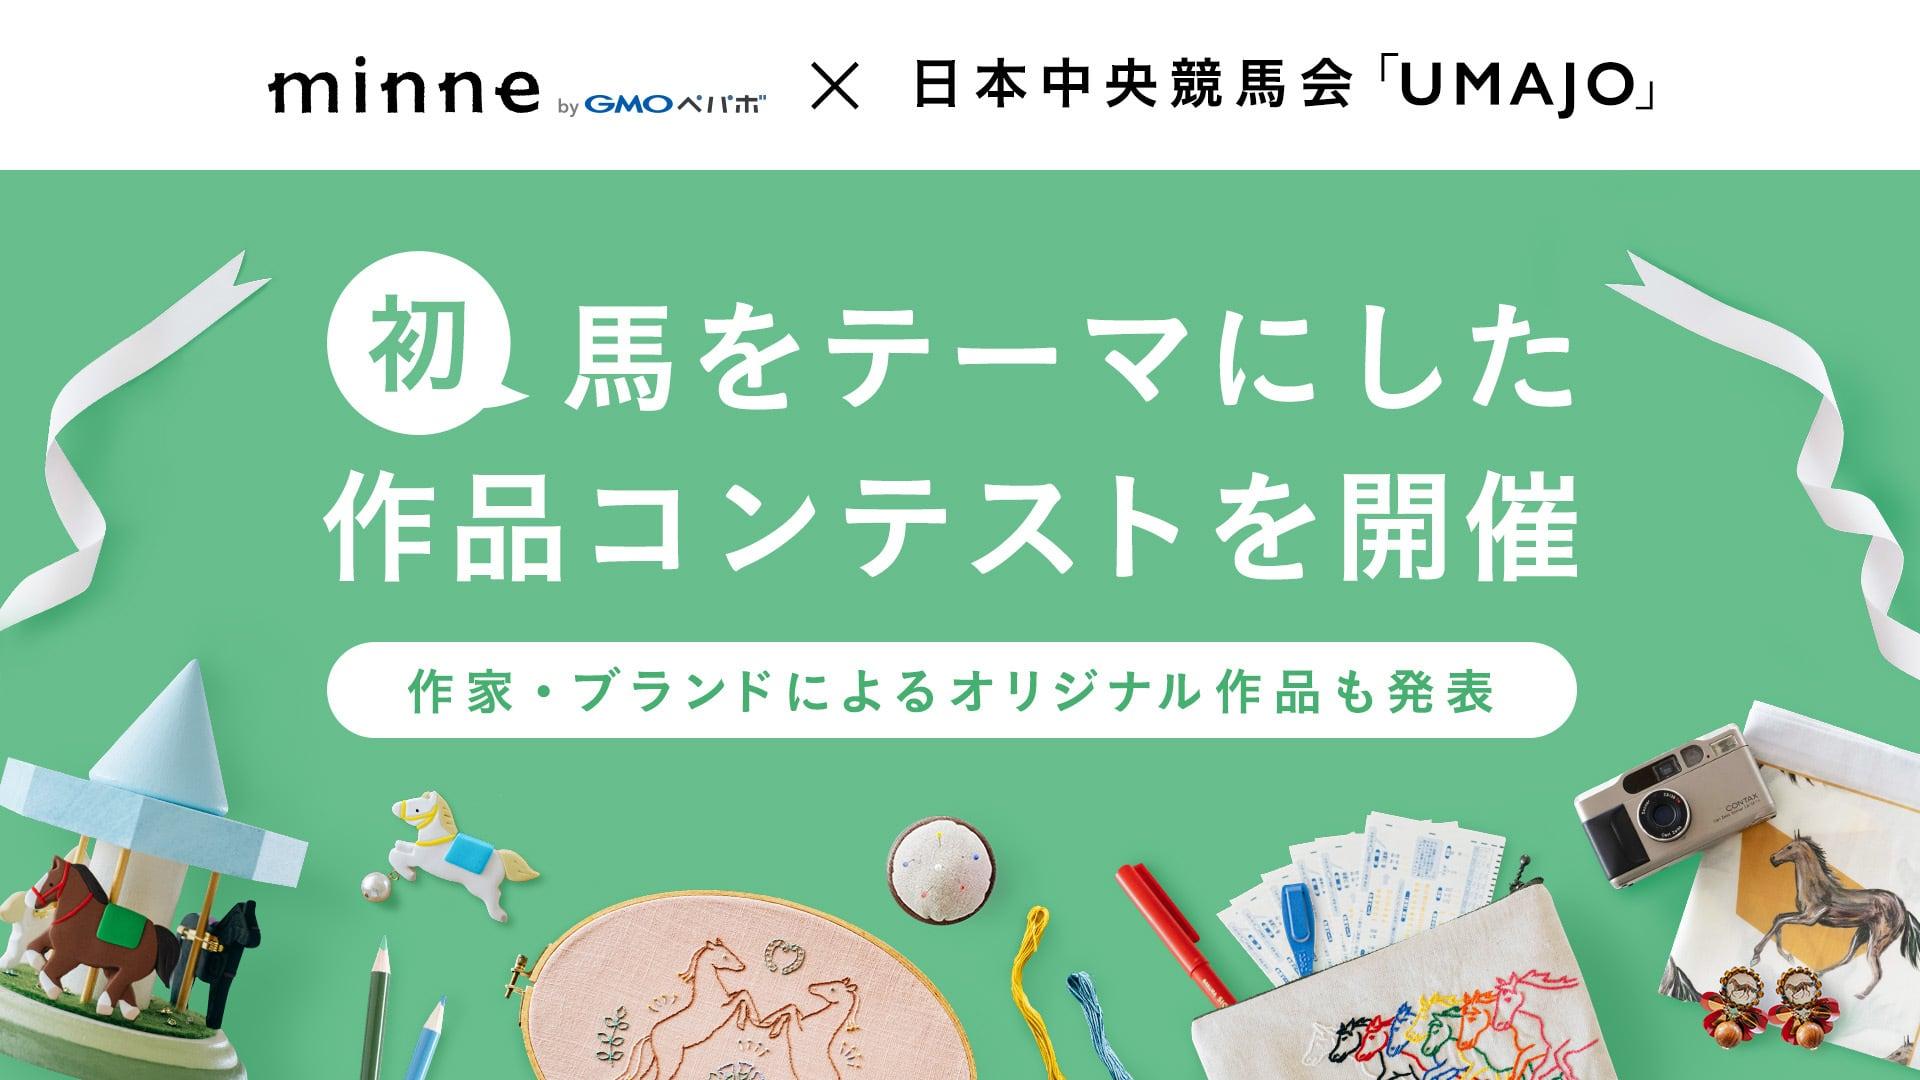 minne byGMOペパボ と日本中央競馬会「UMAJO」がコラボ、初の馬をテーマにした作品コンテストを開催。作家・ブランドによるオリジナル作品も発表。